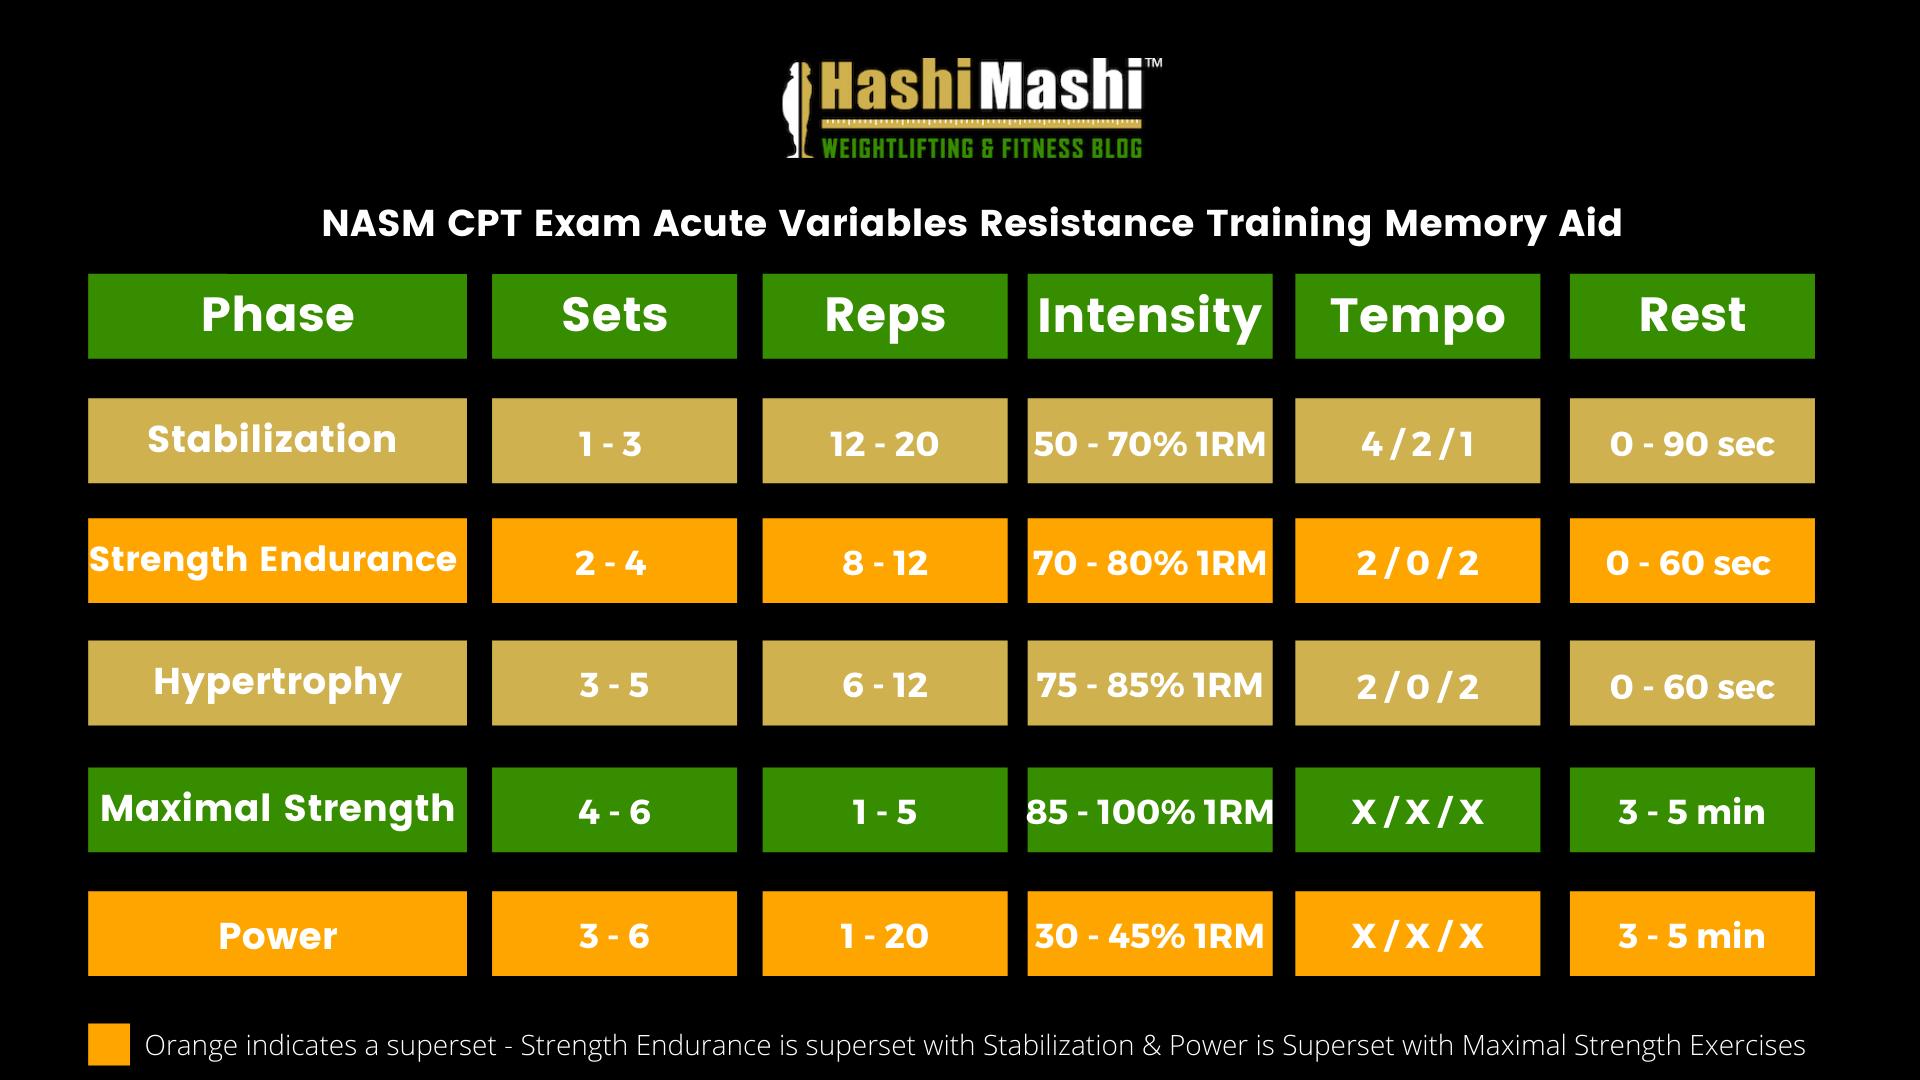 NASM CPT Exam Acute Variables Resistance Training Memory Aid (1)